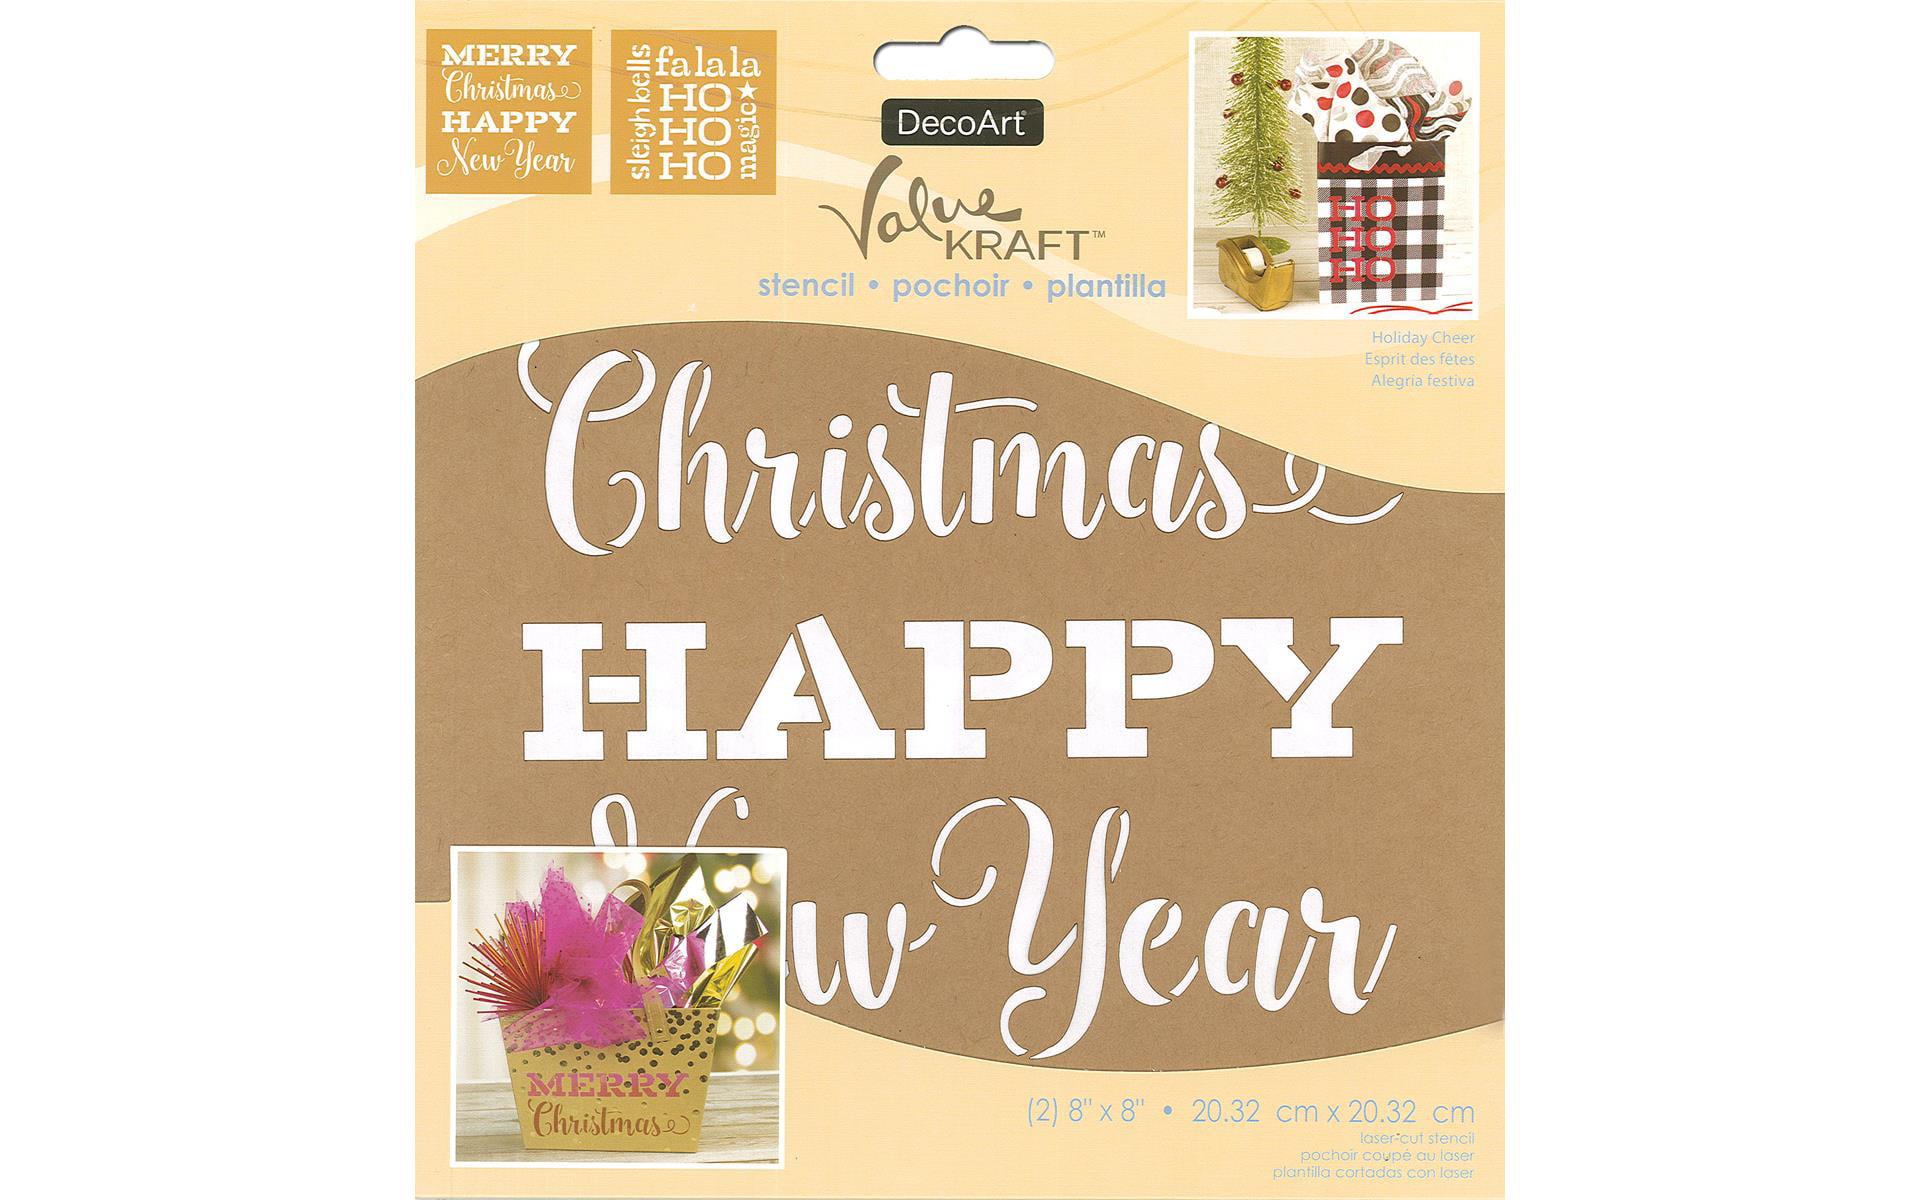 Decoart Value Kraft Stencil 8x8 Christmas